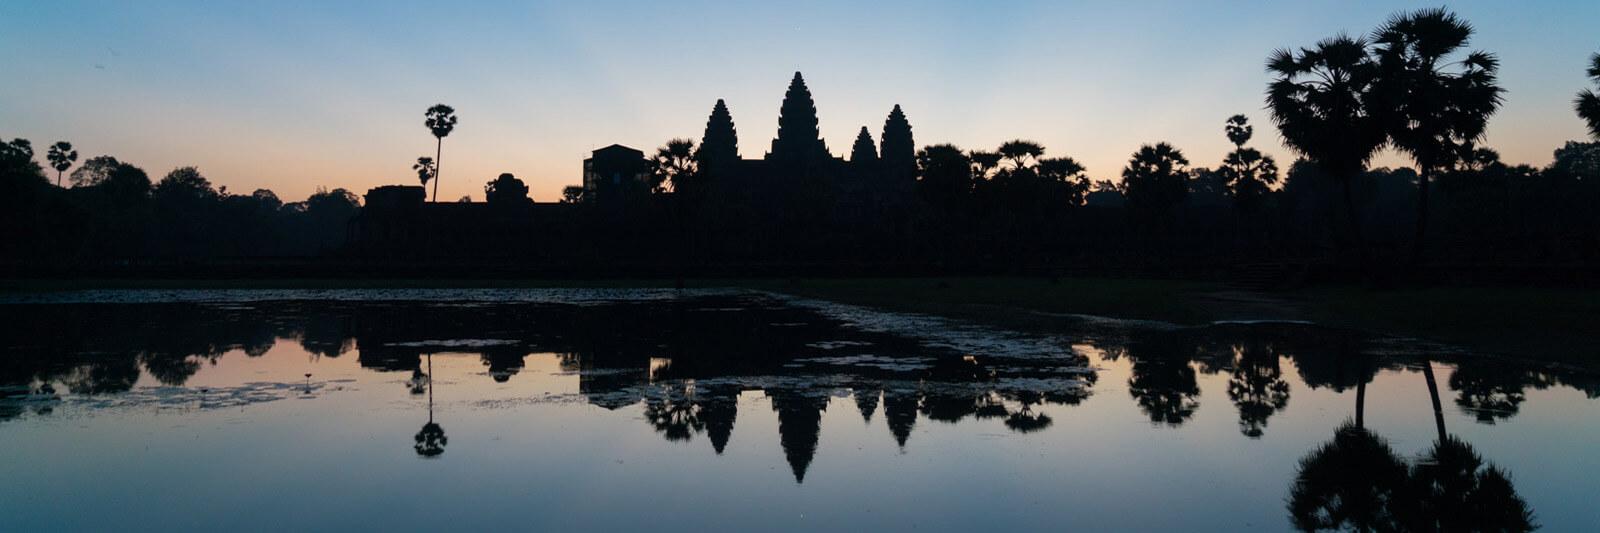 Sunrise at Angkor Wat in Siem Reap, Cambodia